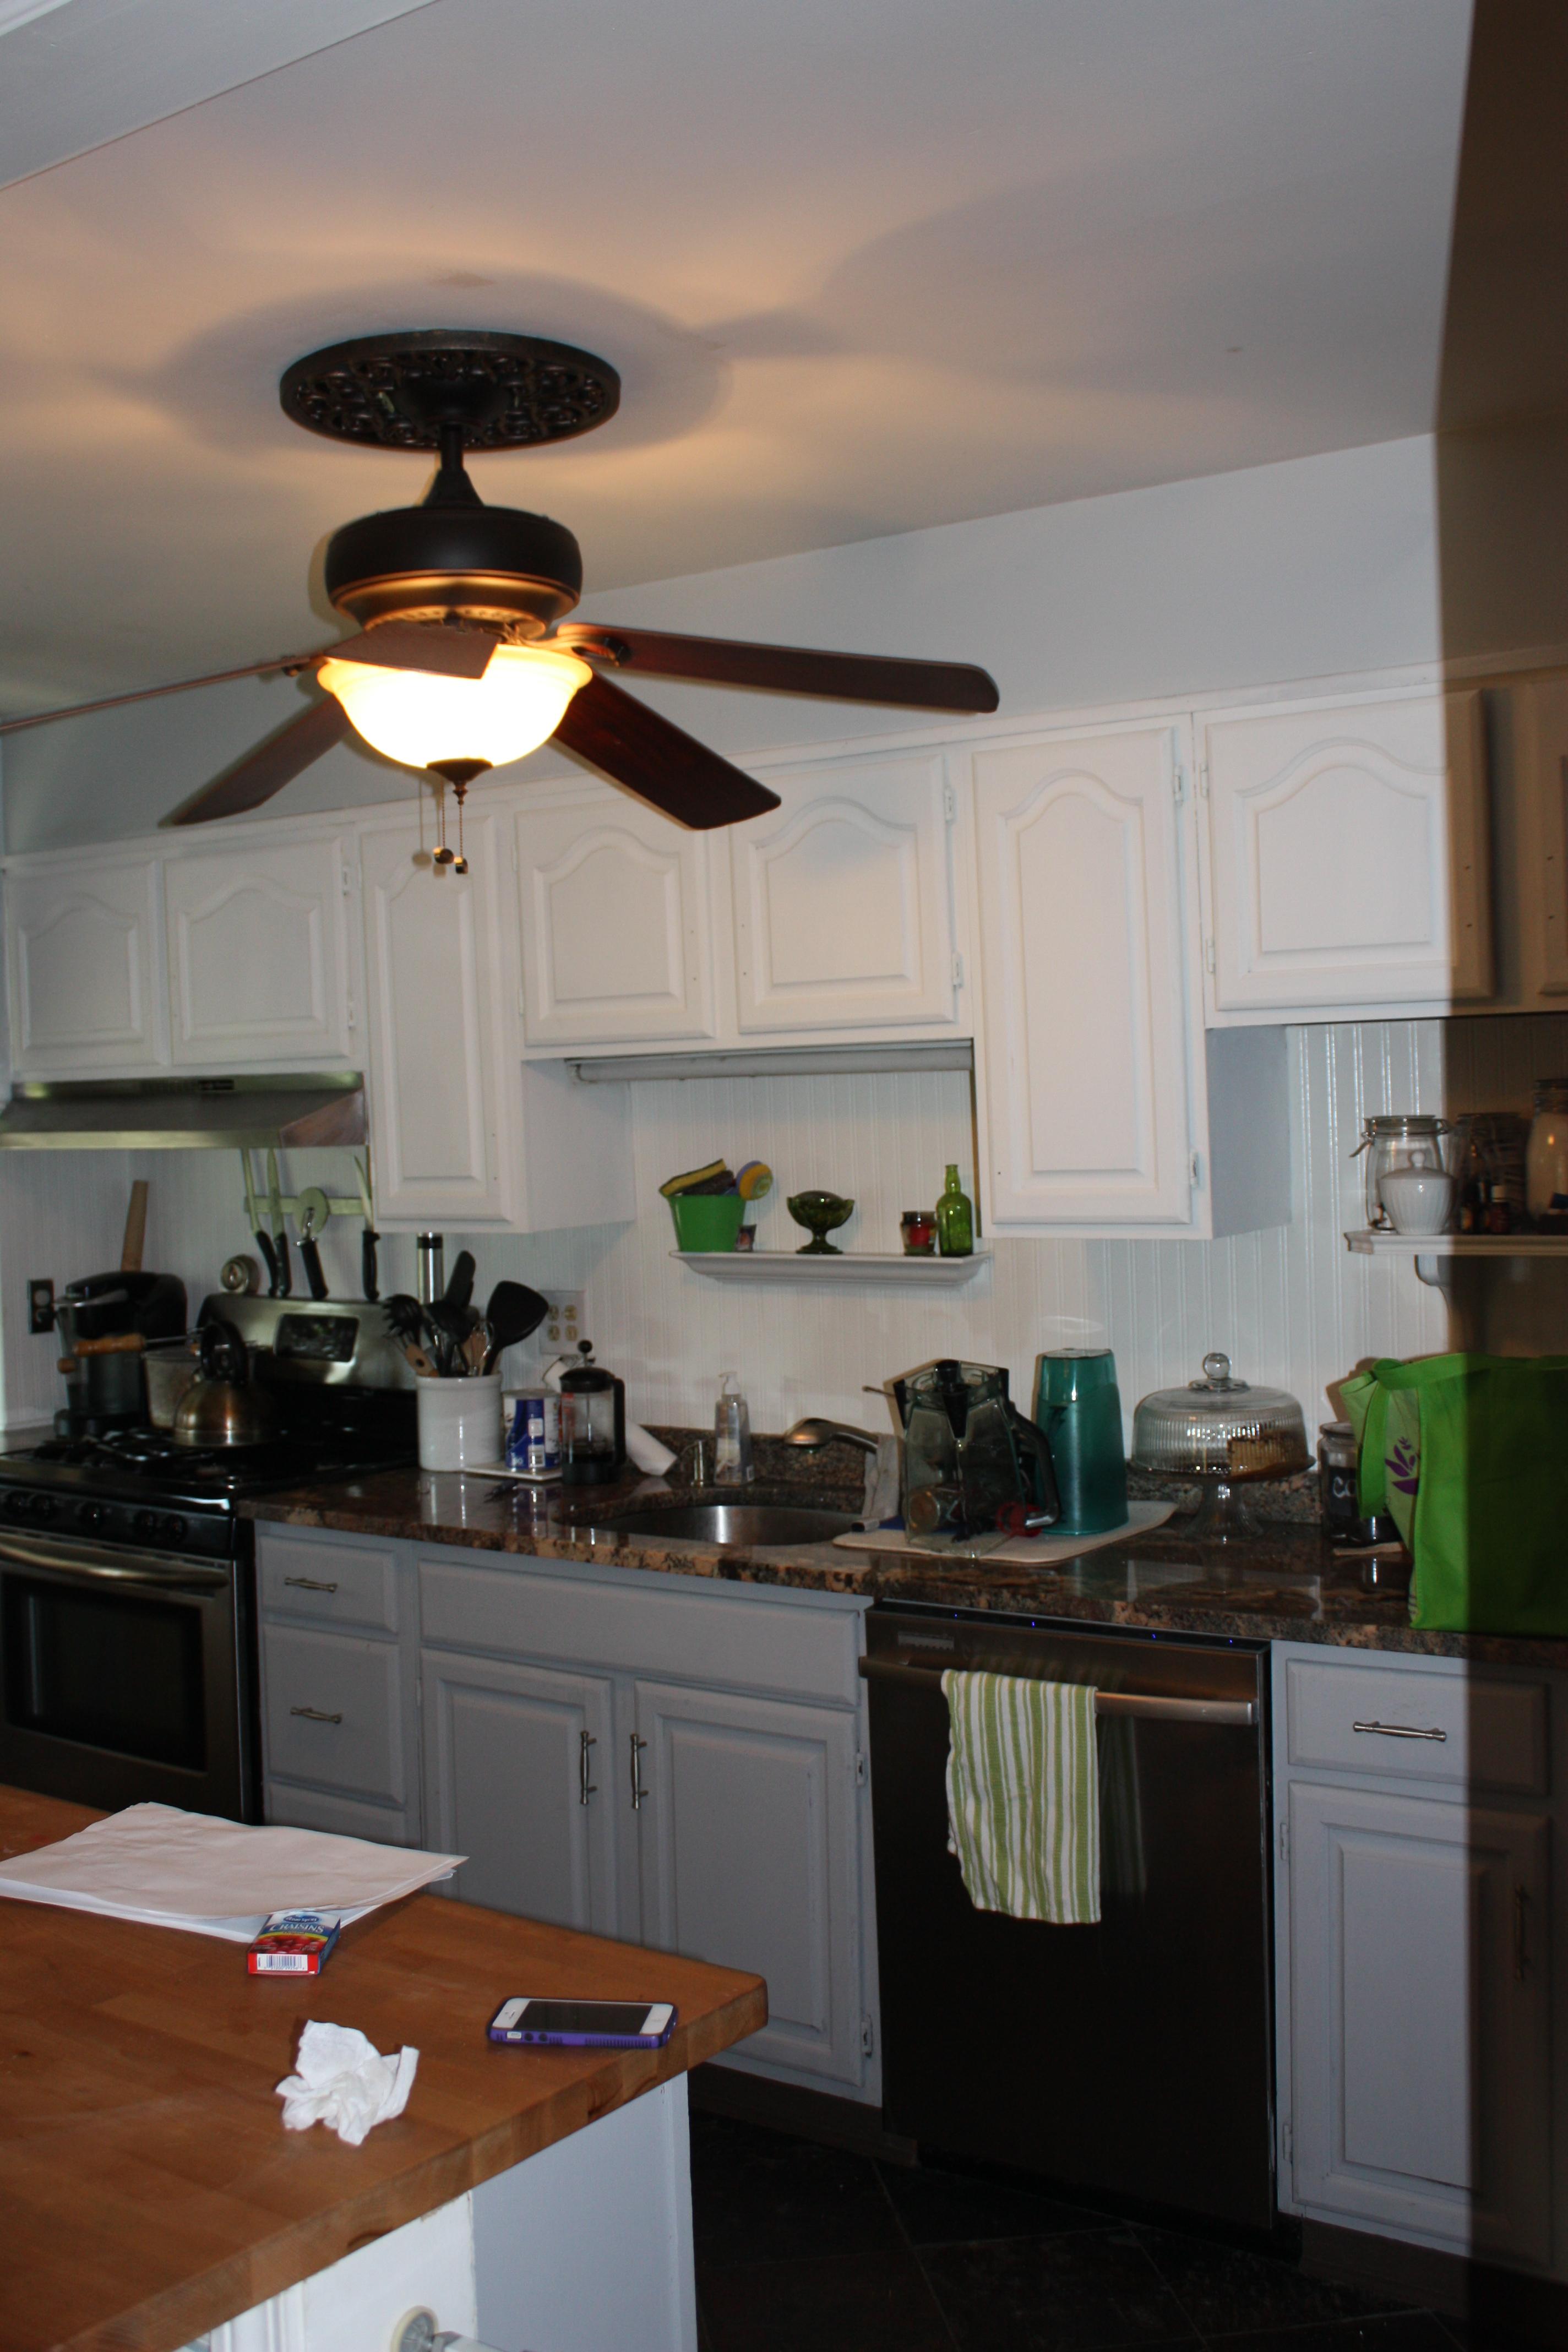 Rona Kitchen Cabinets Painting Kitchen Cabinets Part 1 Teach Love Craft